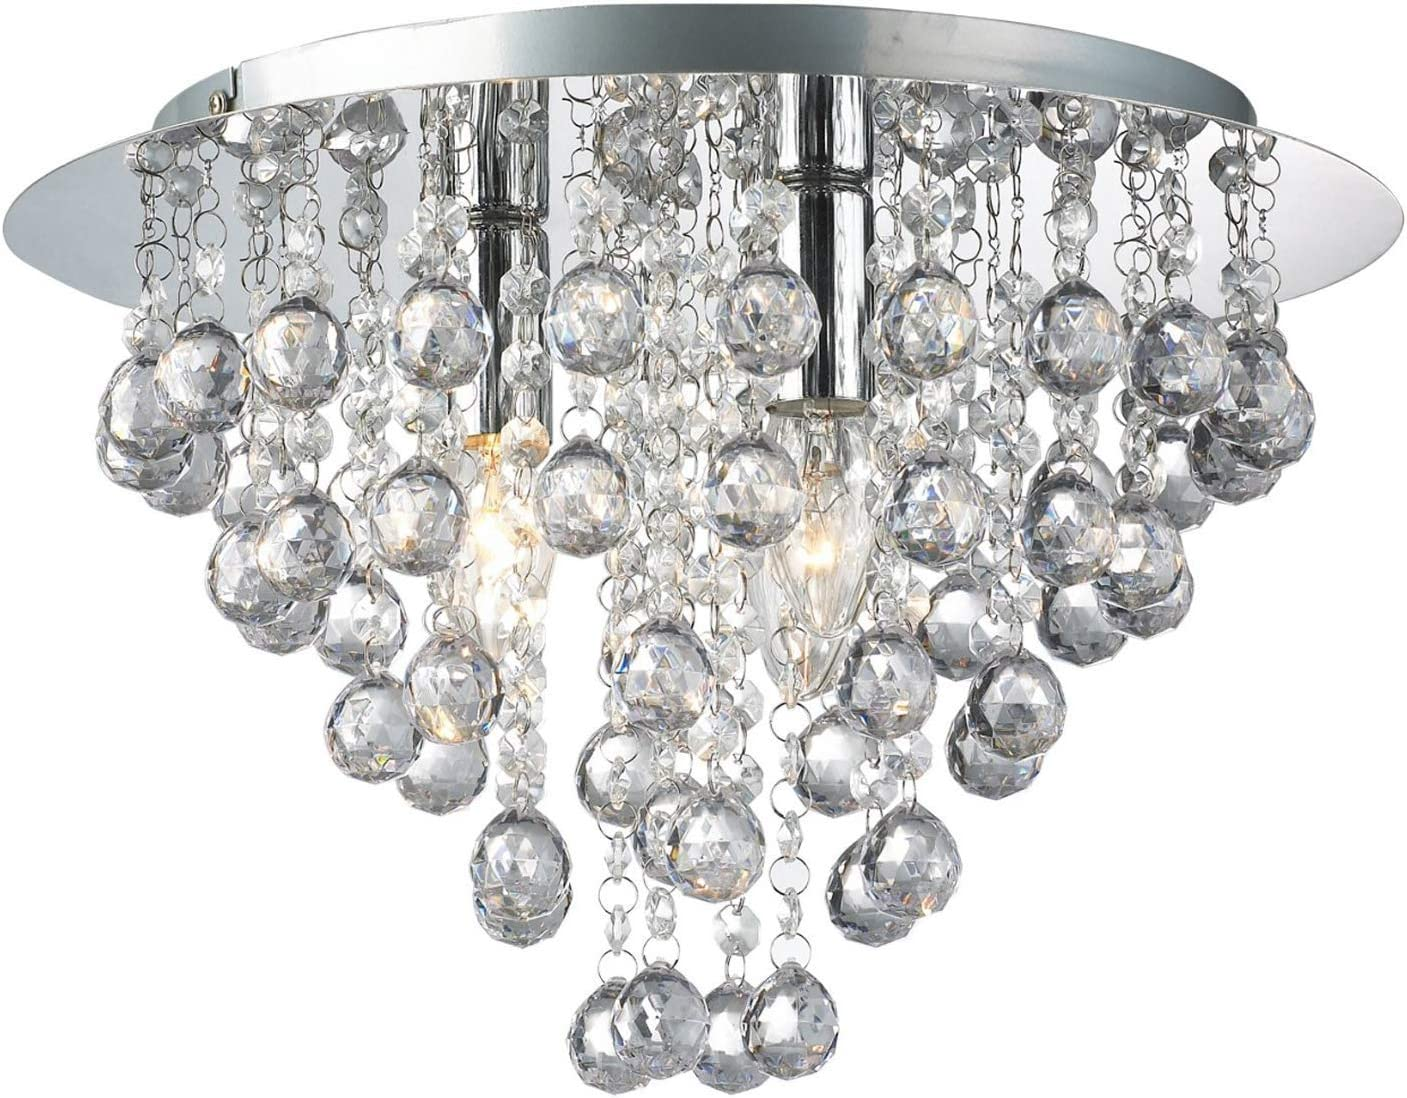 Dst Crystal Chandelier Lighting, Modern Chandeliers Crystal Ball Light Fixture with 5 Lights, Flush Mount LED Ceiling Light for Hallway, Bedroom, Living Room, Kitchen, Dining Room, Size D18 H13